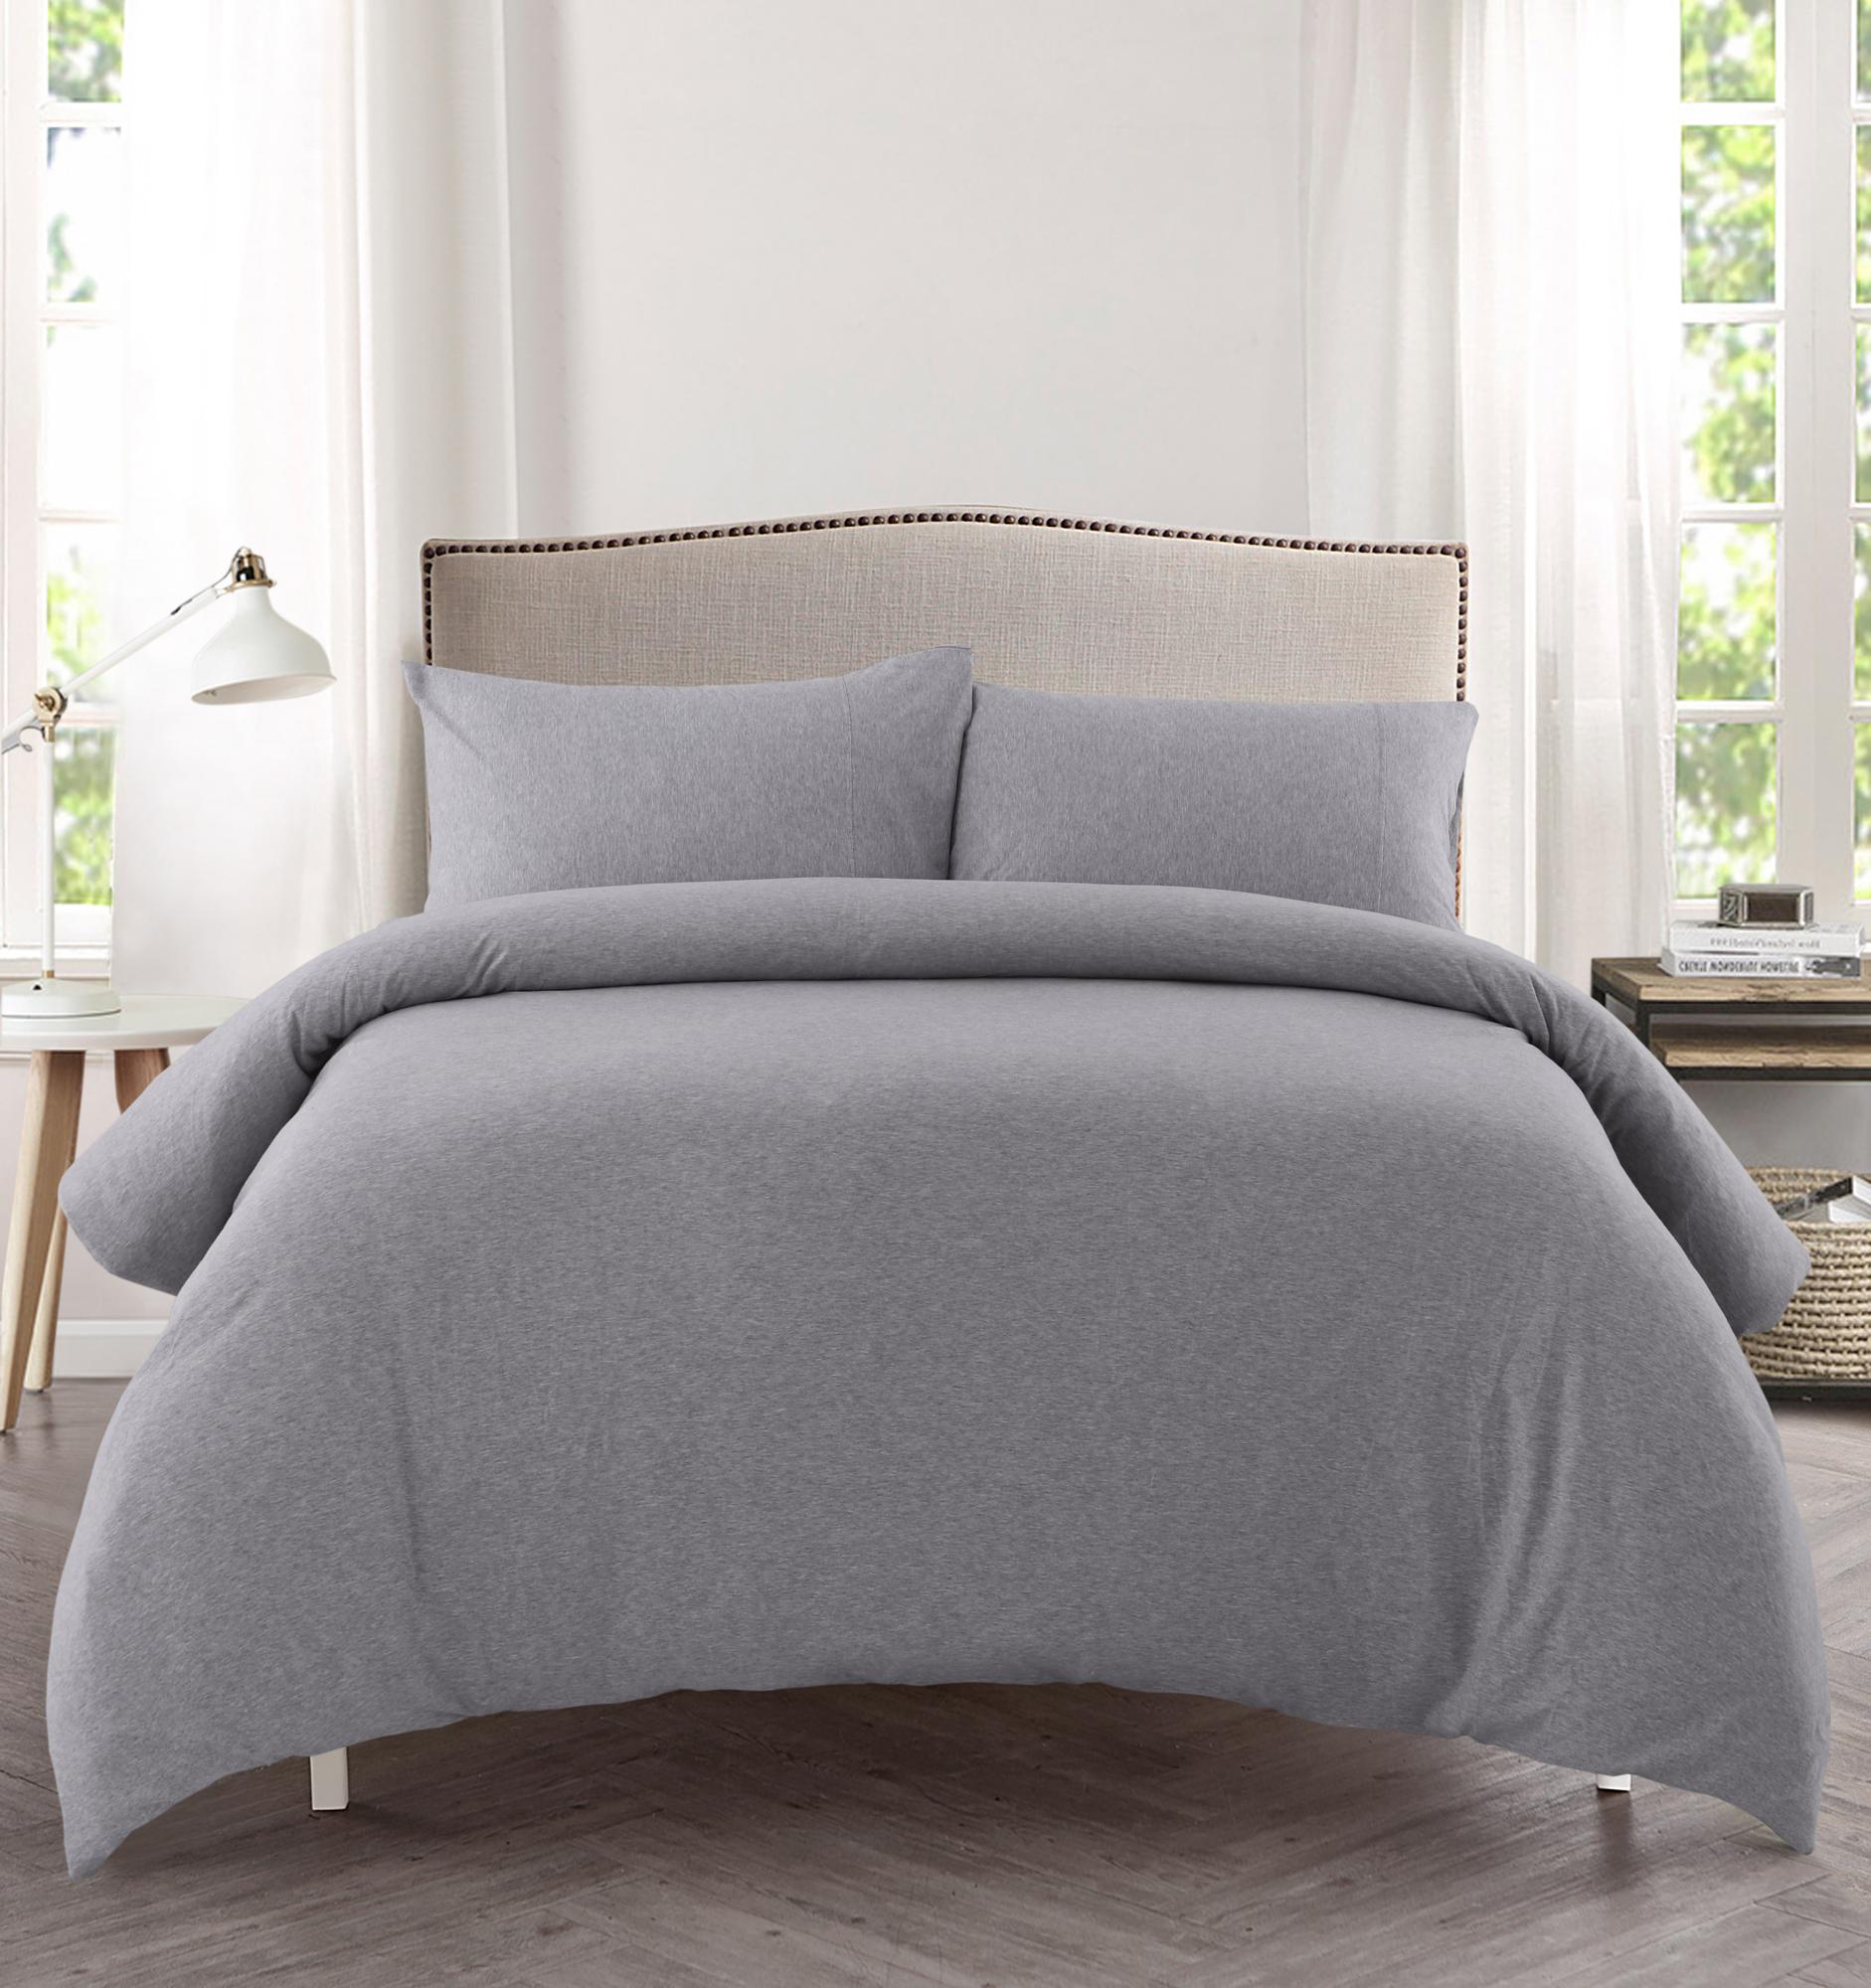 Dreamaker Grey Jersey Cotton Quilt Cover Set Reviews Temple Webster